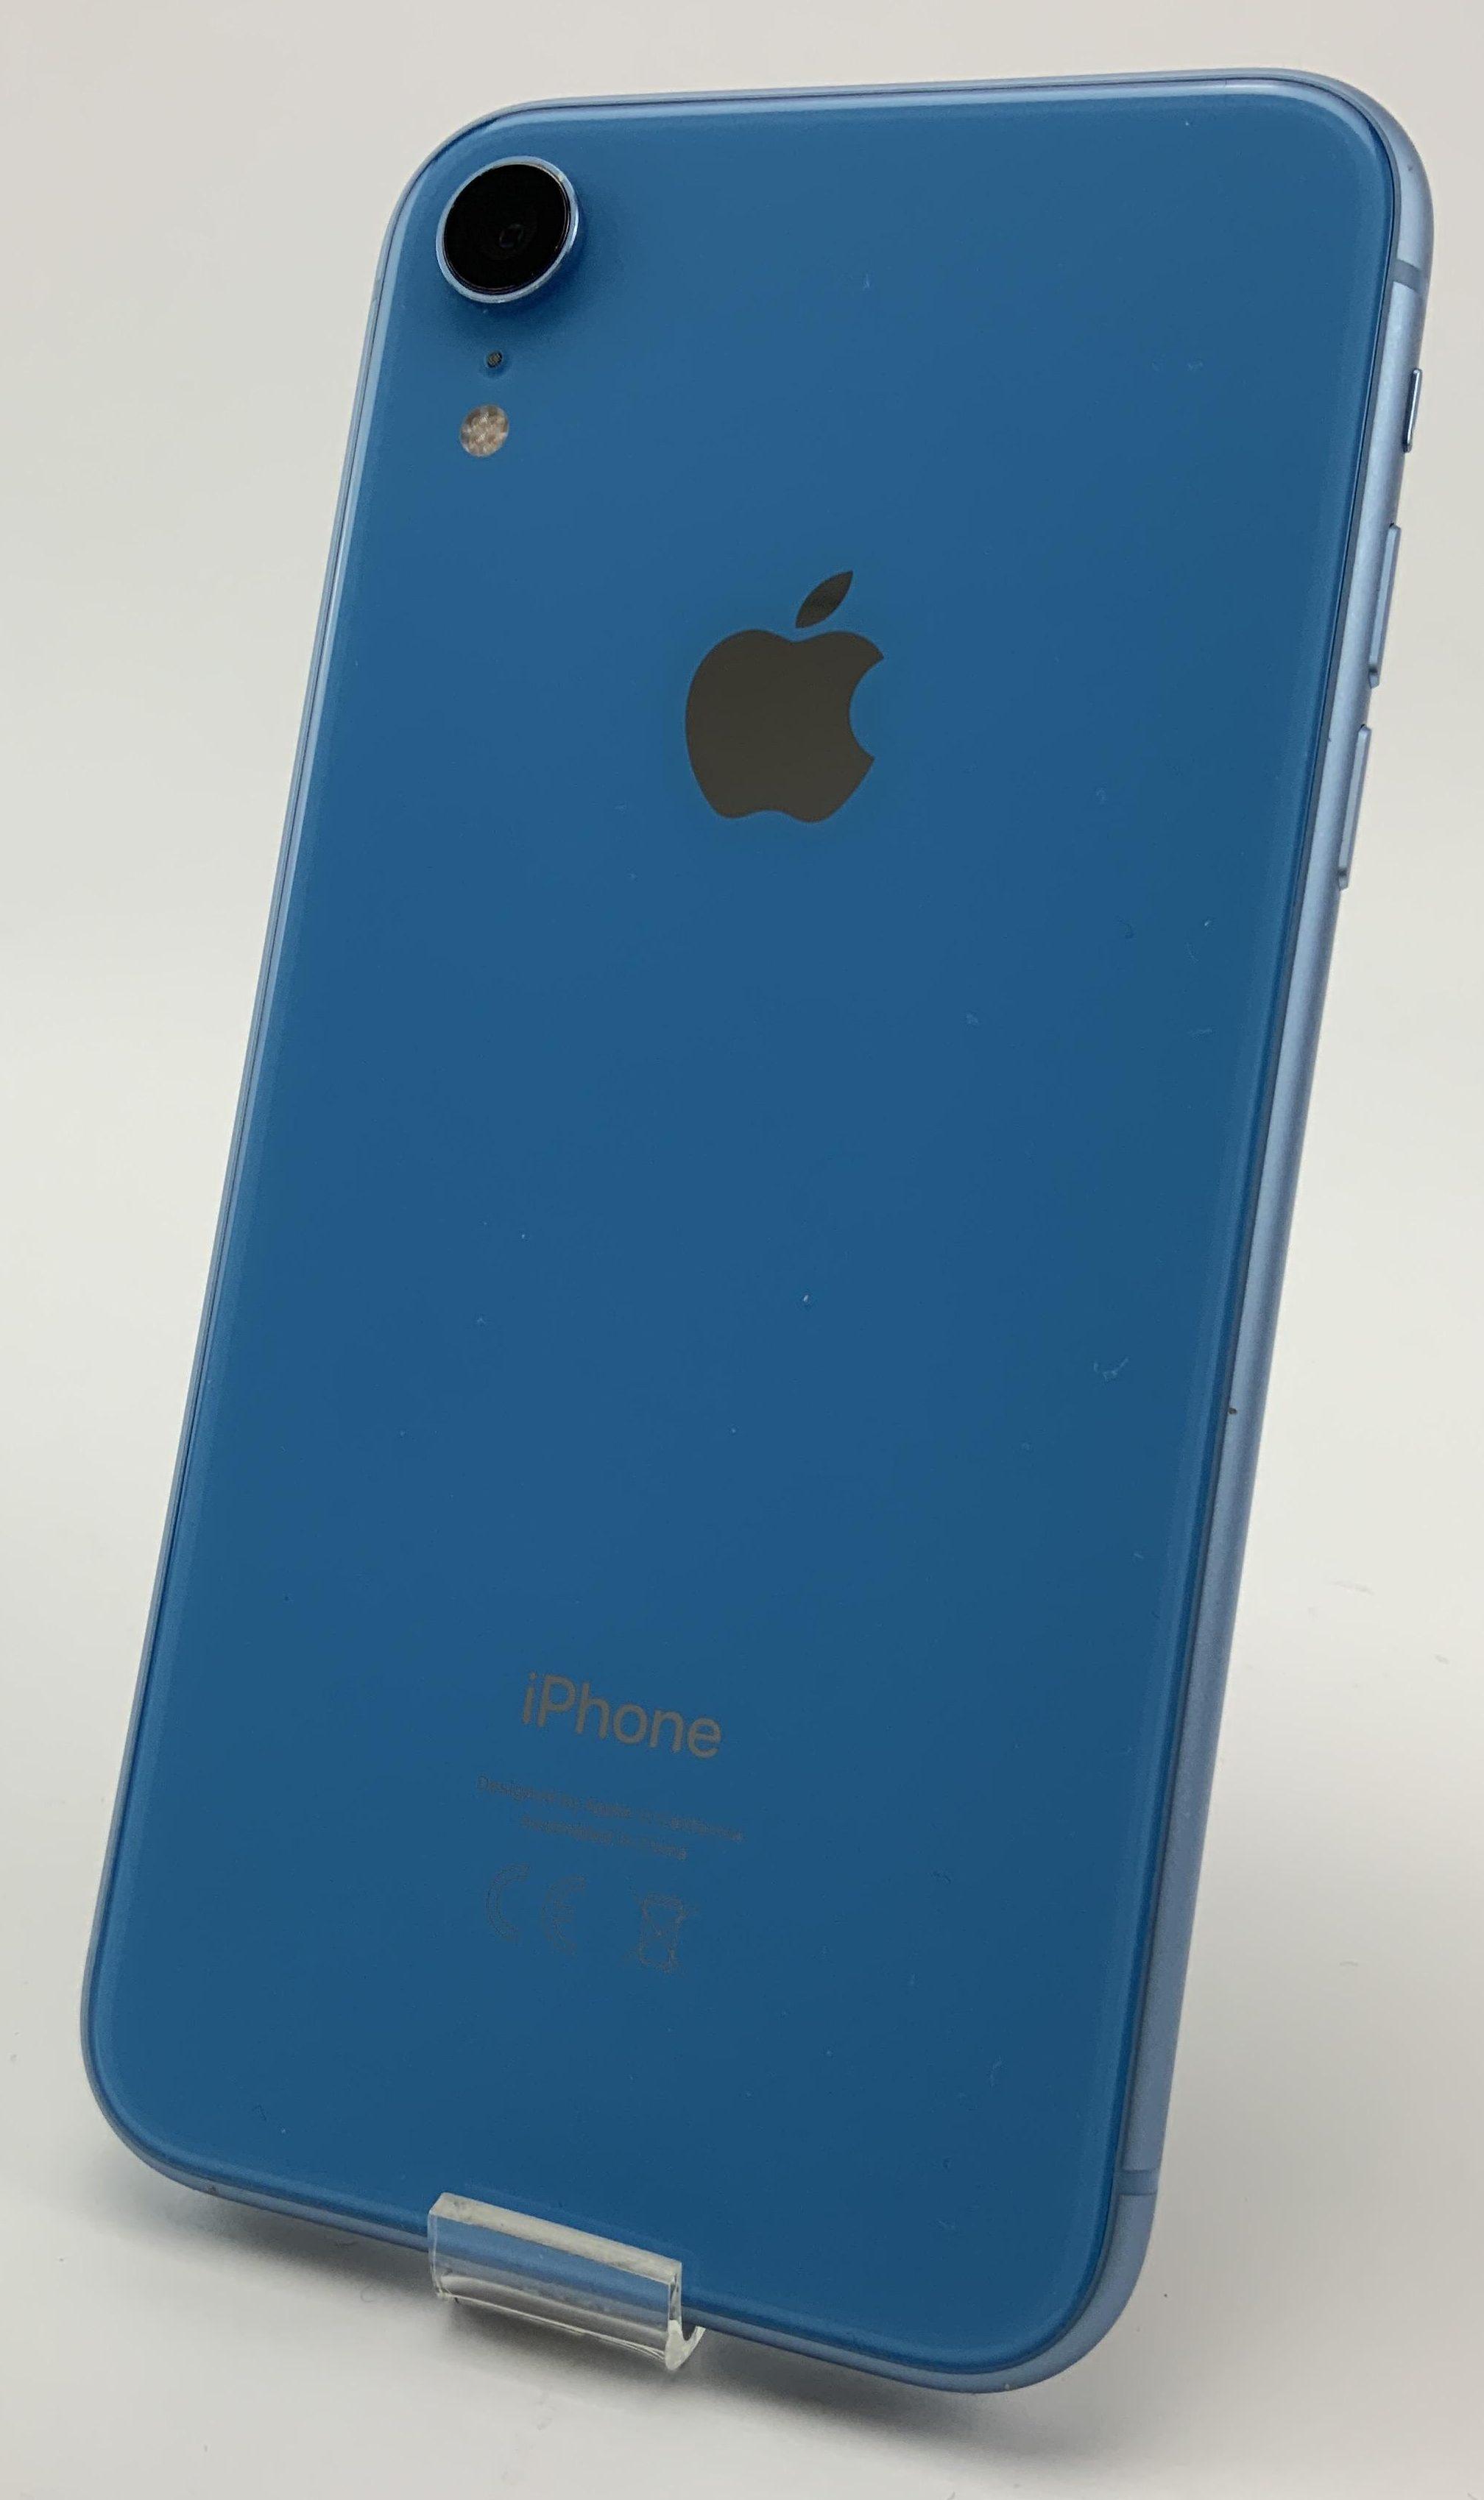 iPhone XR 64GB, 64GB, Blue, image 2